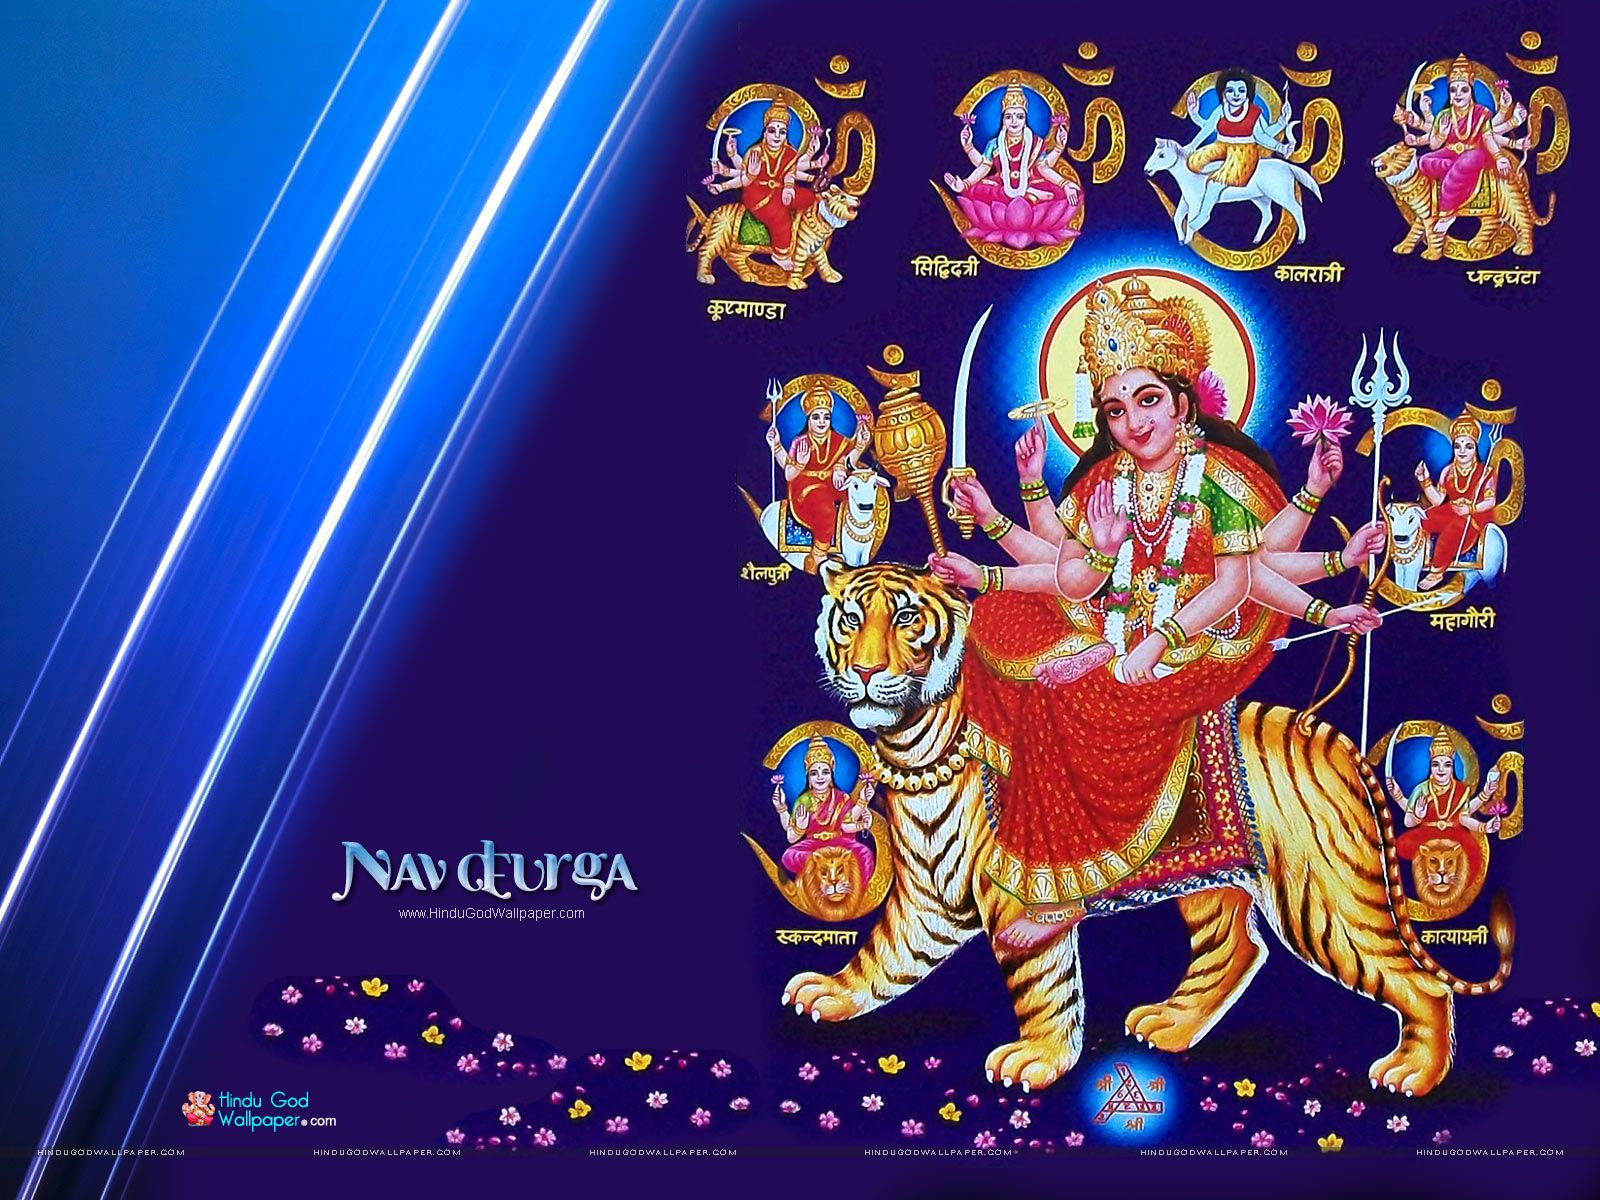 Maa Durga 9 Roop Wallpaper Free Download